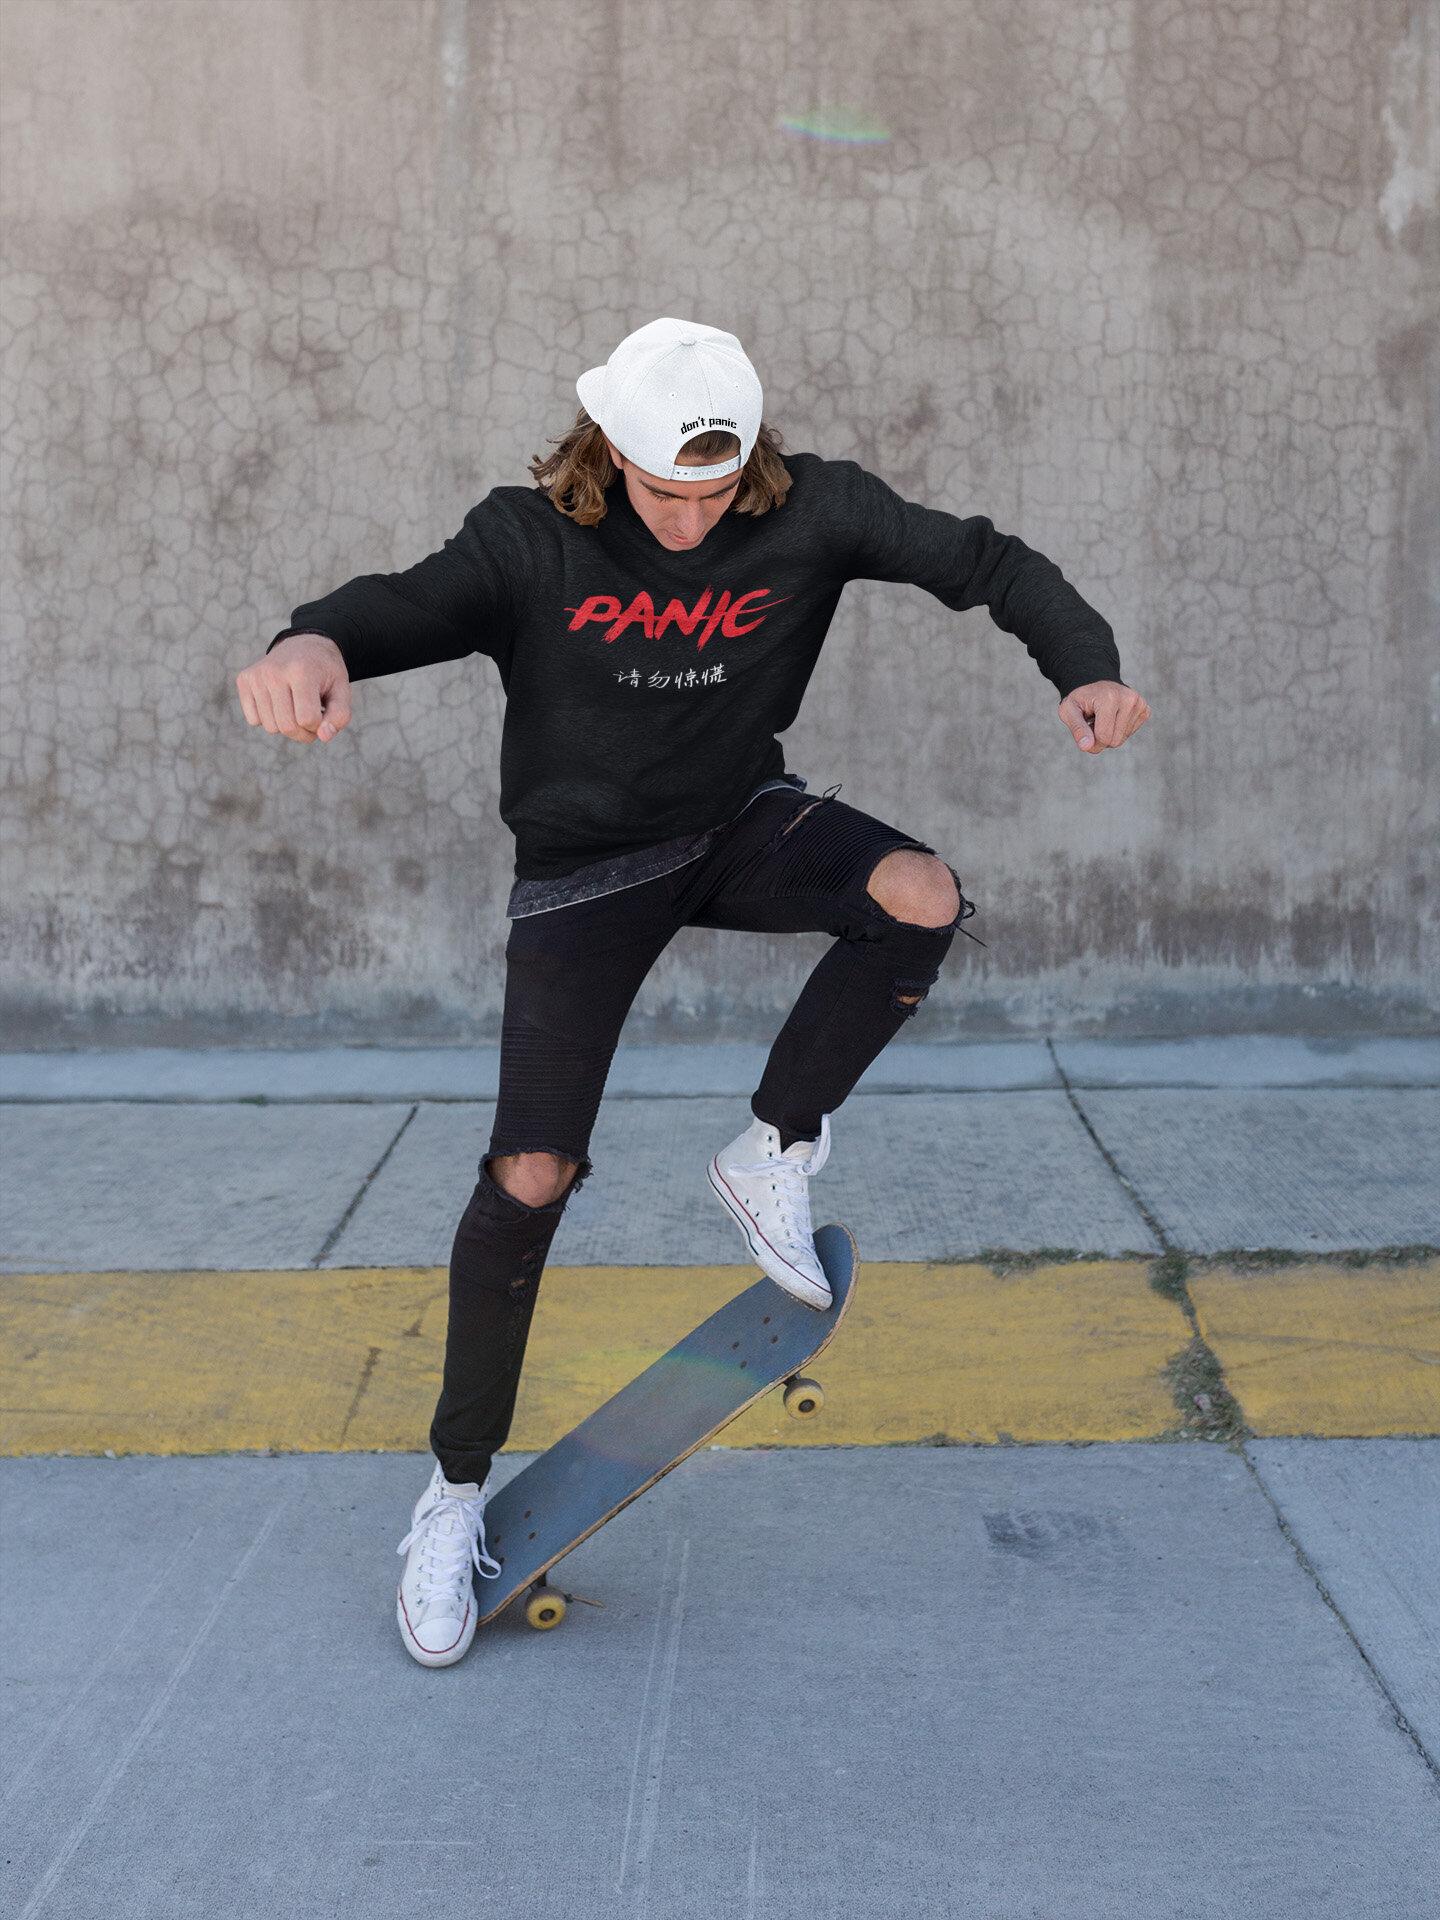 mockup-of-a-man-wearing-a-sweatshirt-doing-skate-tricks-18167-capedit.jpg